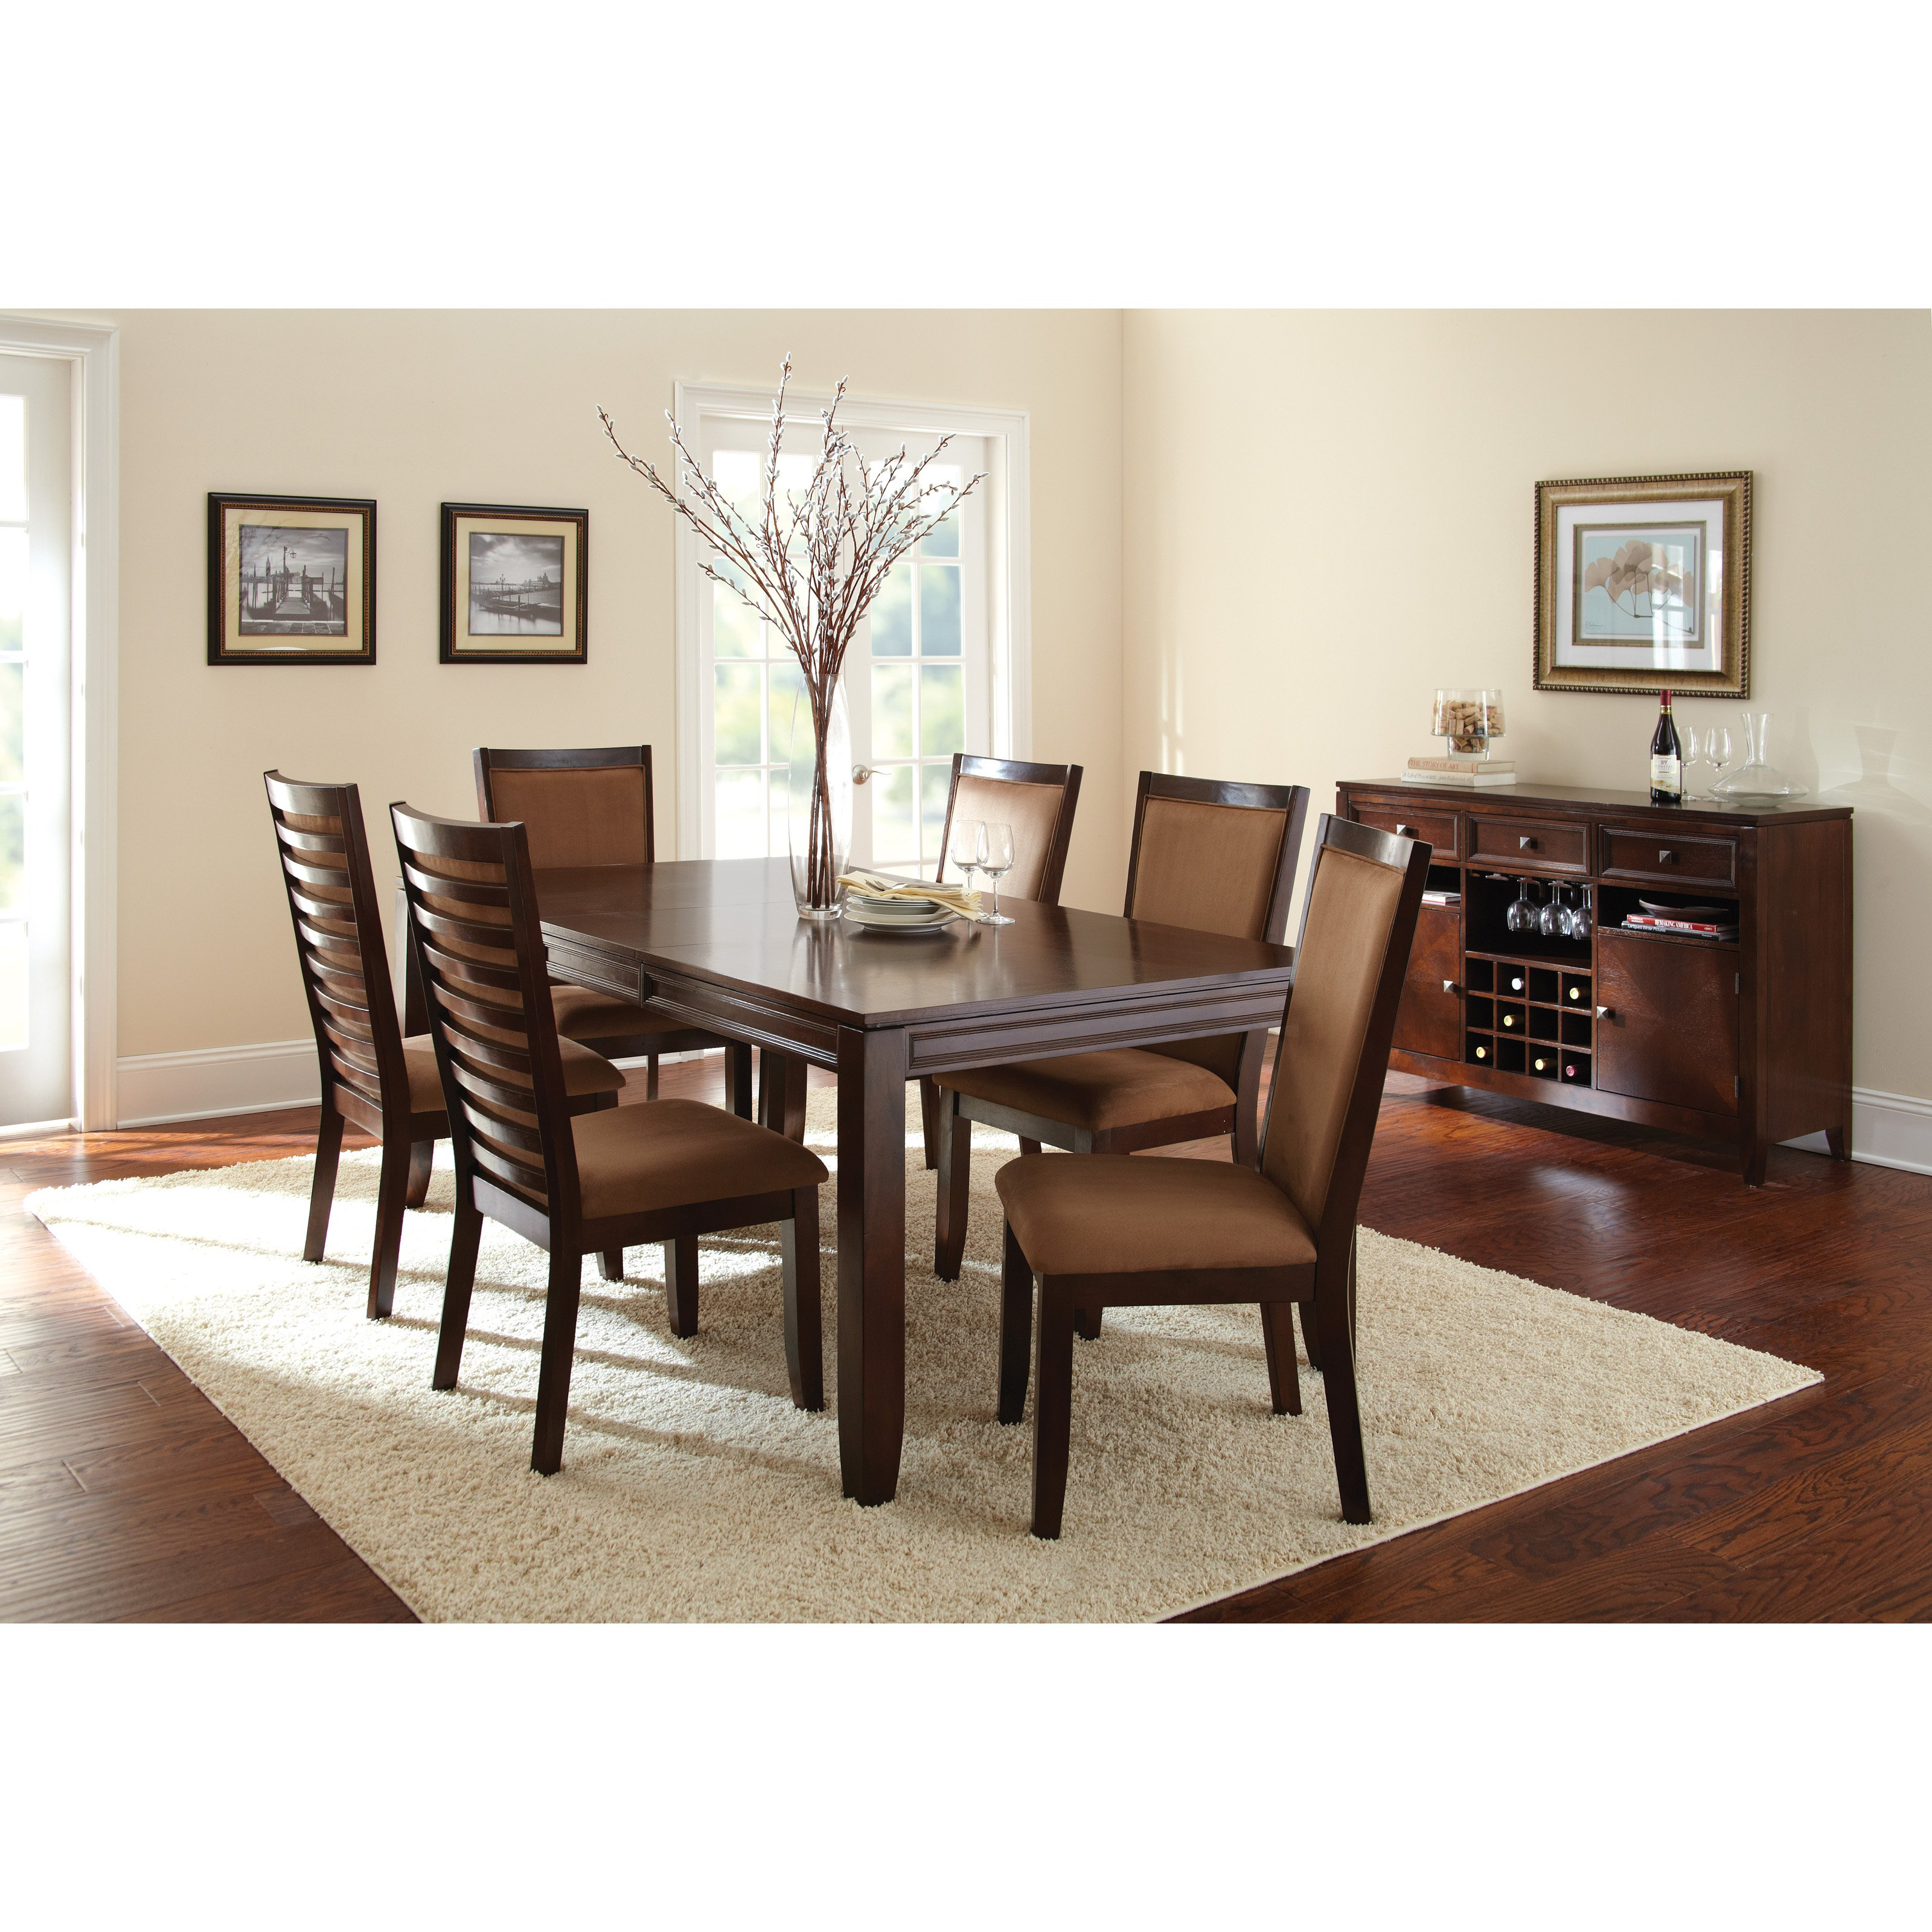 Steve Silver Cornell 7 Piece Dining Table Set - Espresso